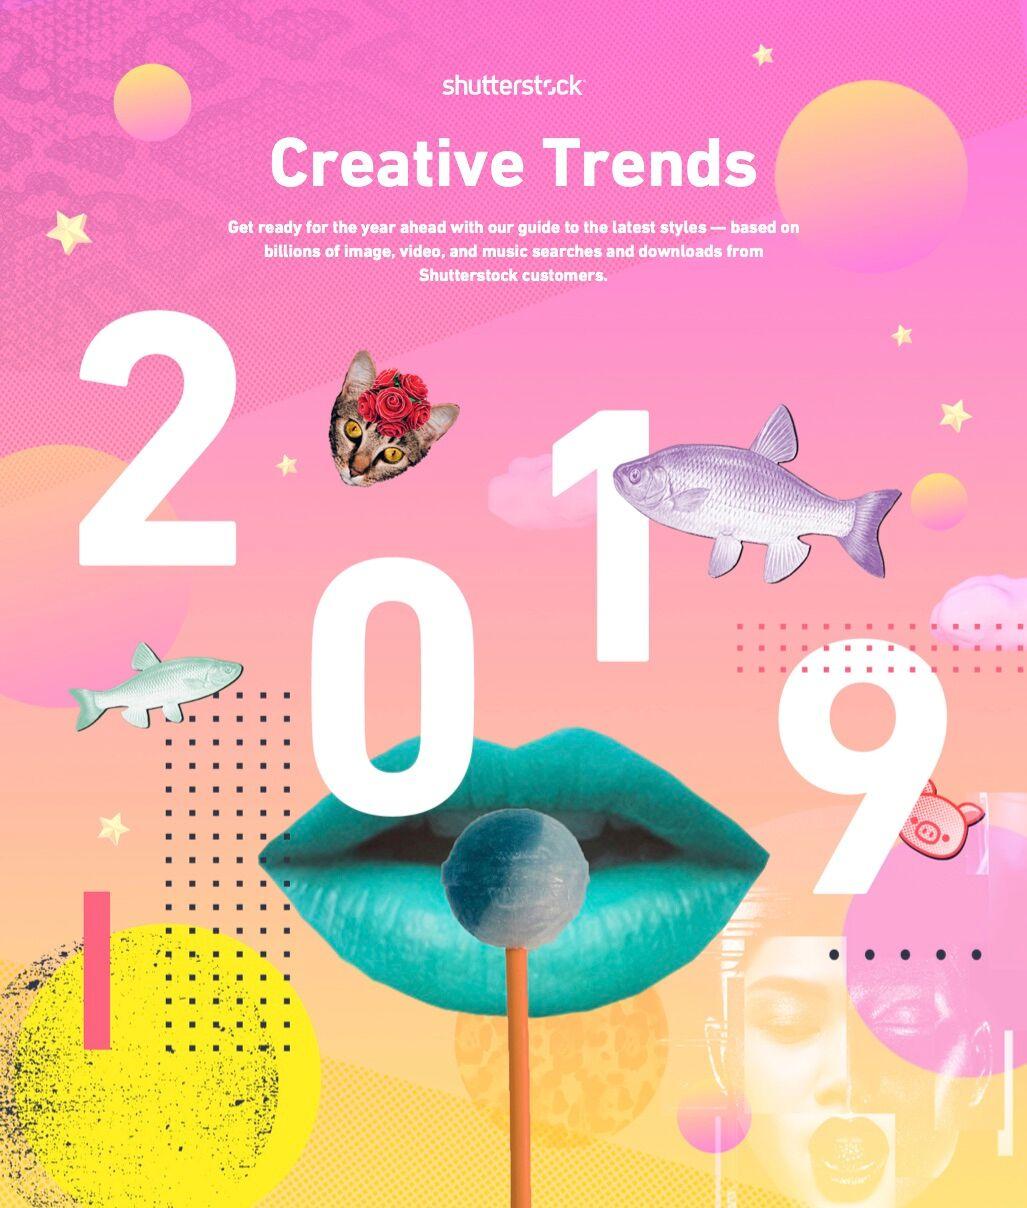 shutterstock creative trends